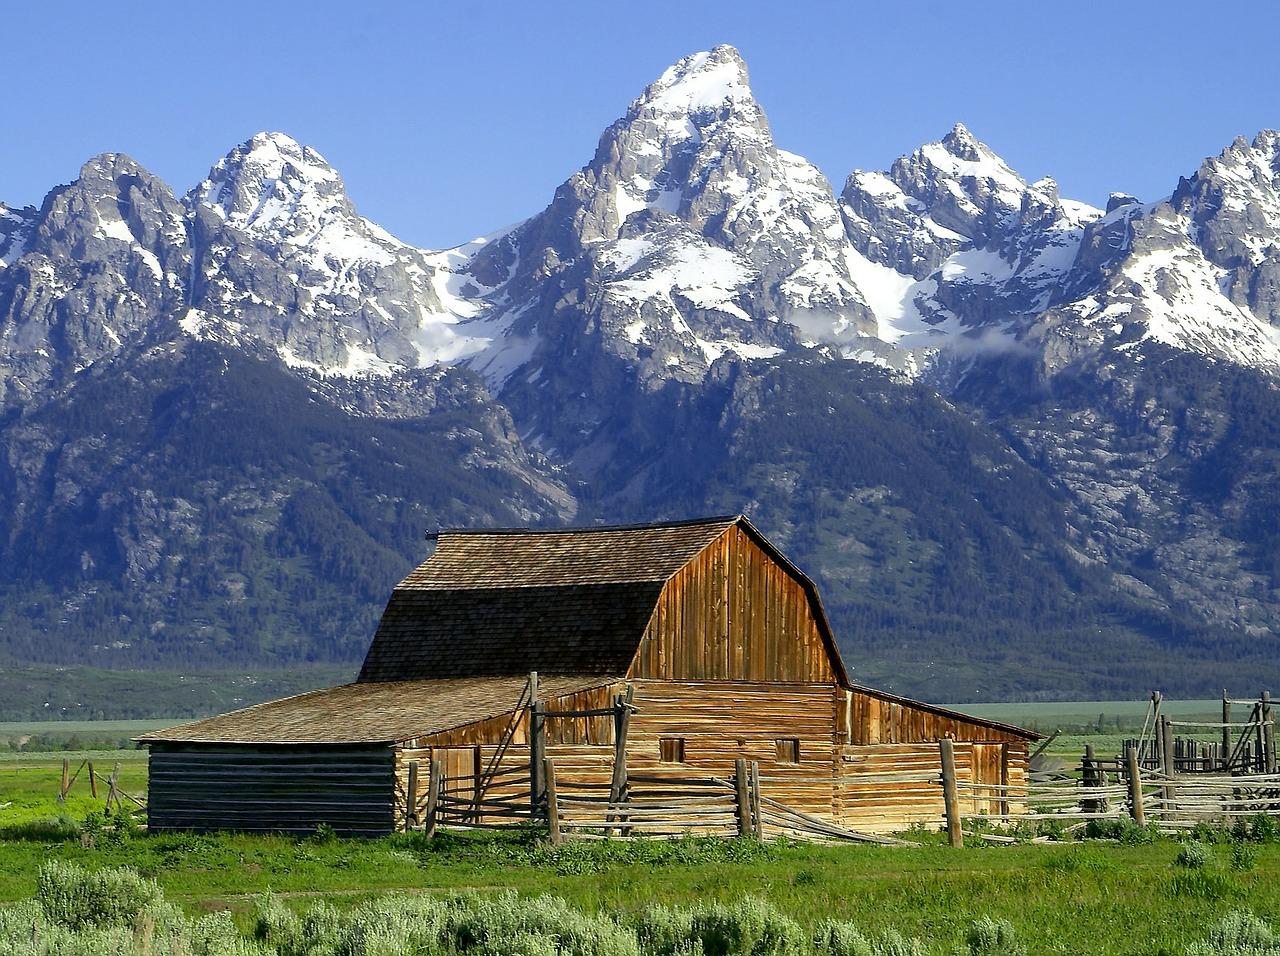 The T. A. Molton Barn below the Teton Range in Grand Teton National Park, WY.